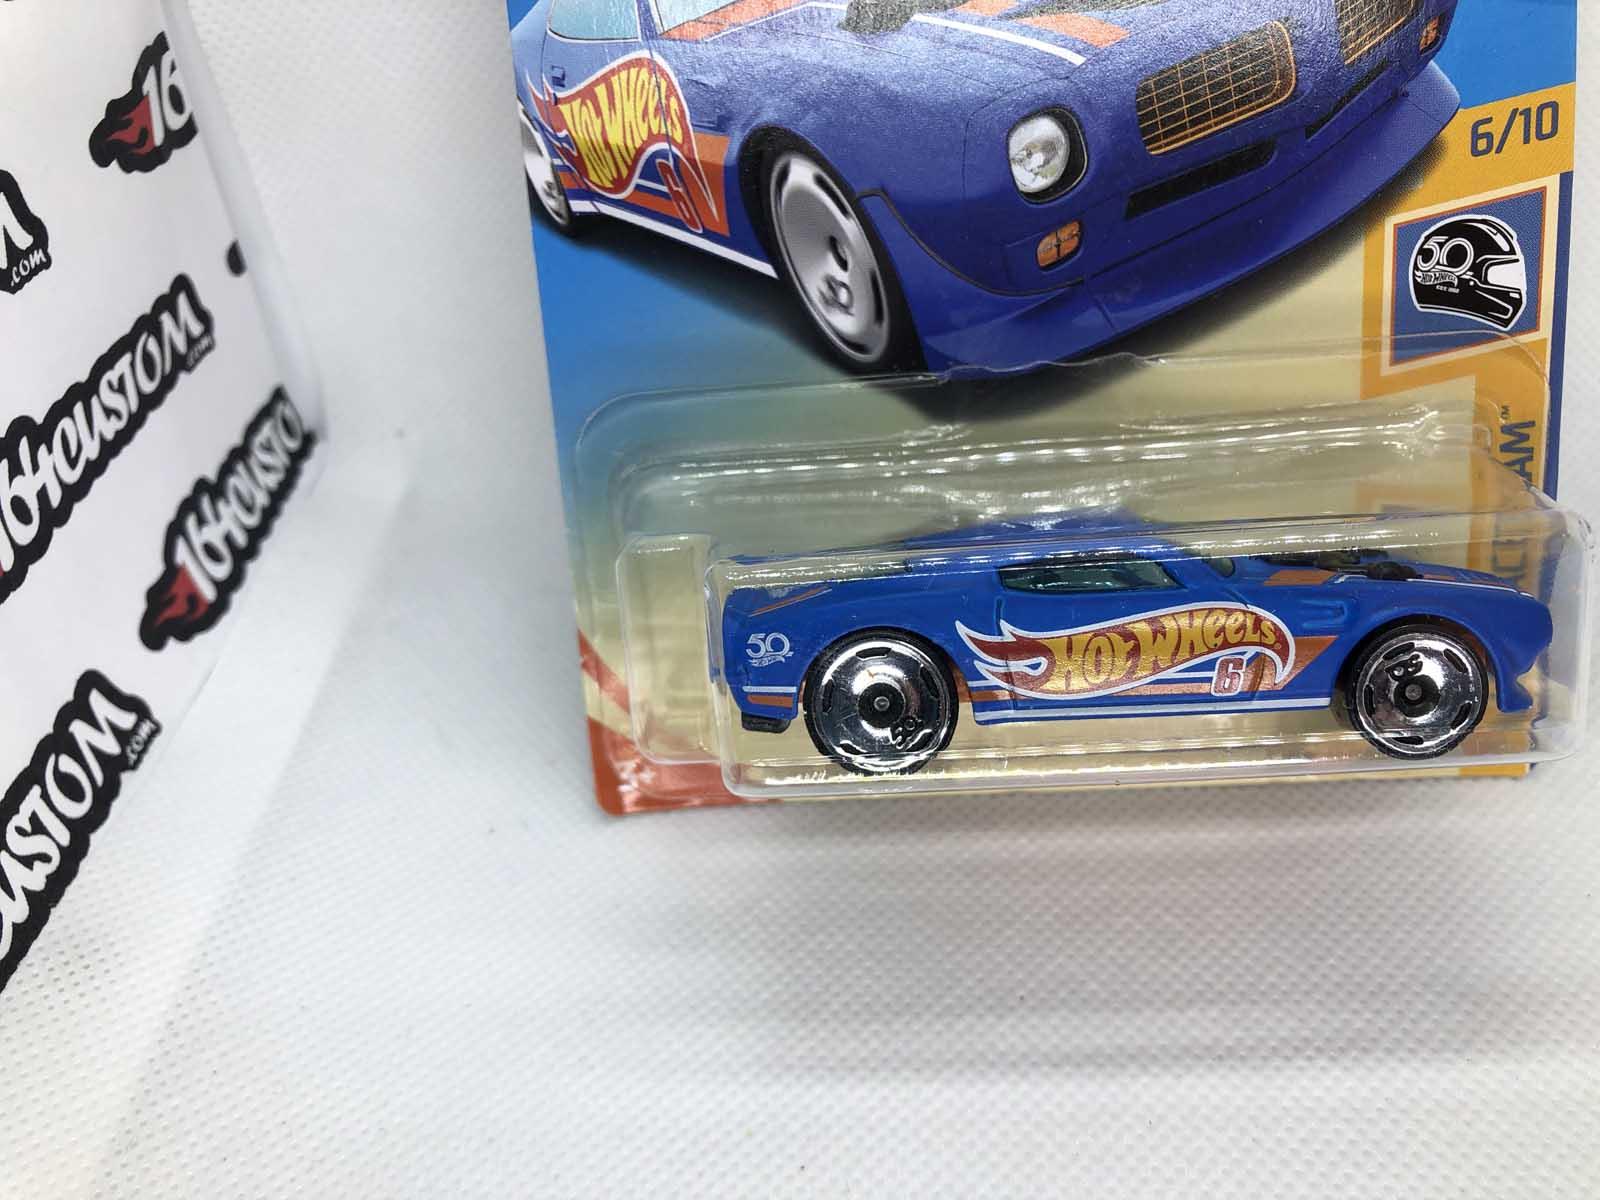 70 Pontiac Firebird